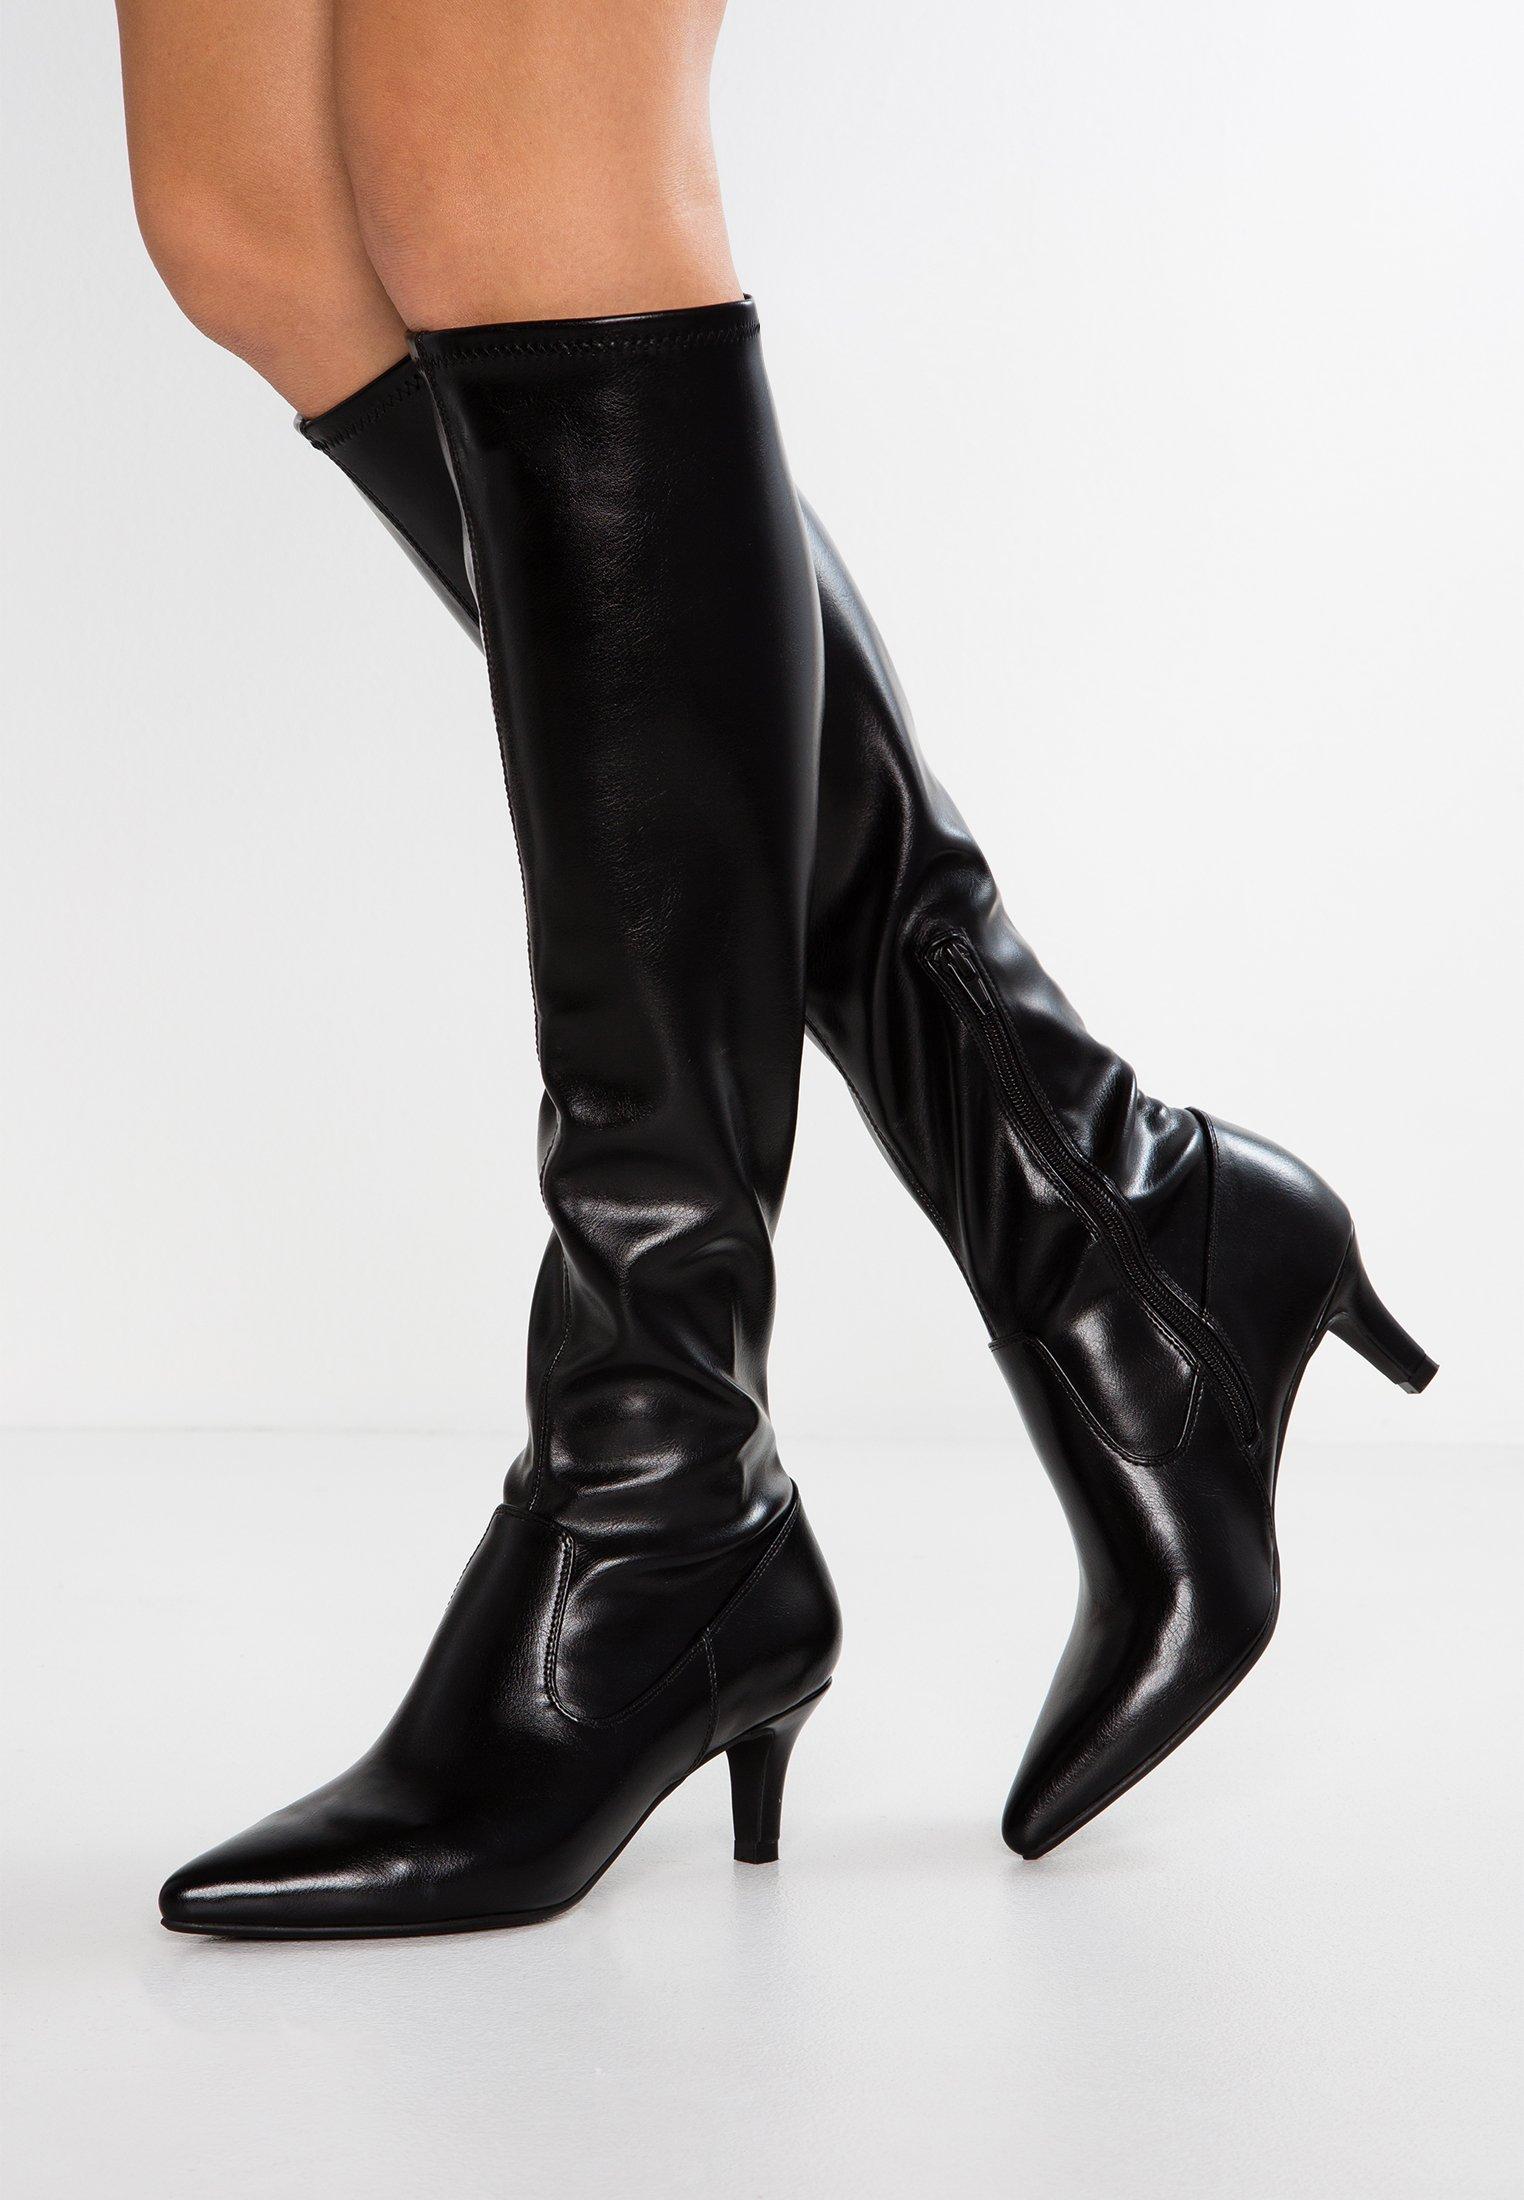 Online Cheapest Anna Field Boots - black | women's shoes 2020 ozc2j